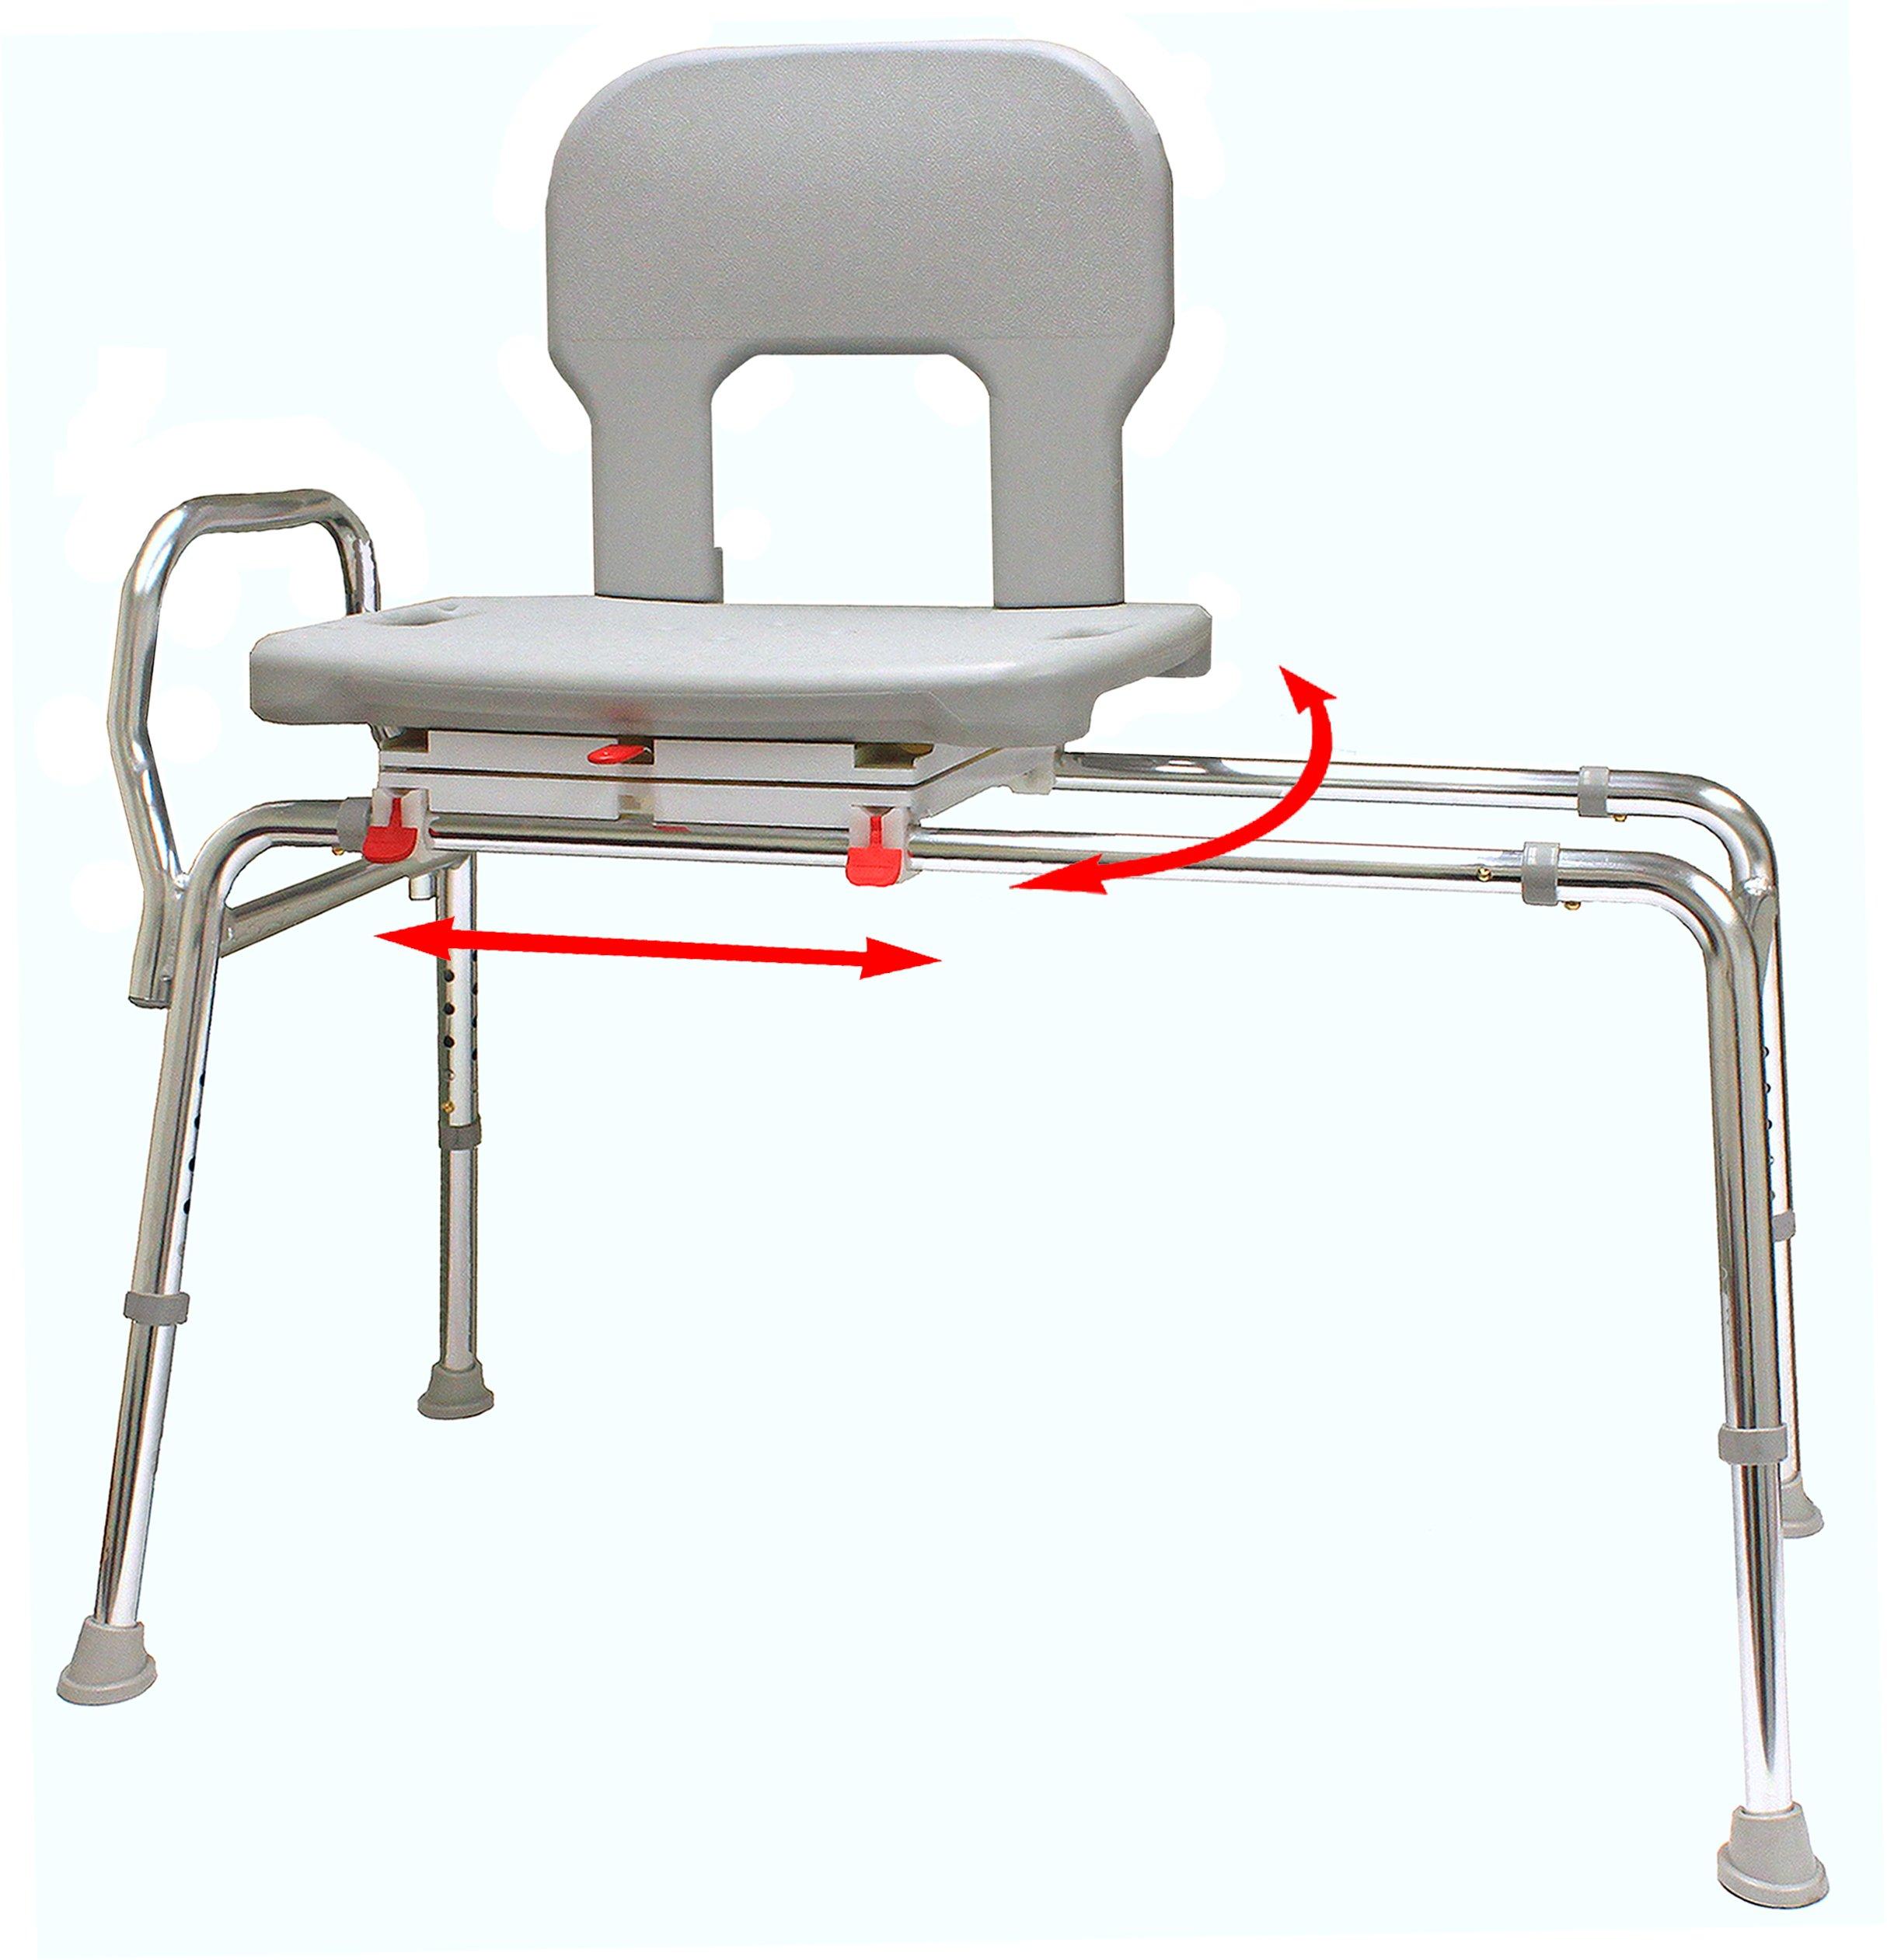 Bariatric Swivel Sliding Bath Transfer Bench (55662) - Regular (Base Length: 39'' - 39.5'') - Heavy-Duty Shower Bathtub Chair - Eagle Health Supplies